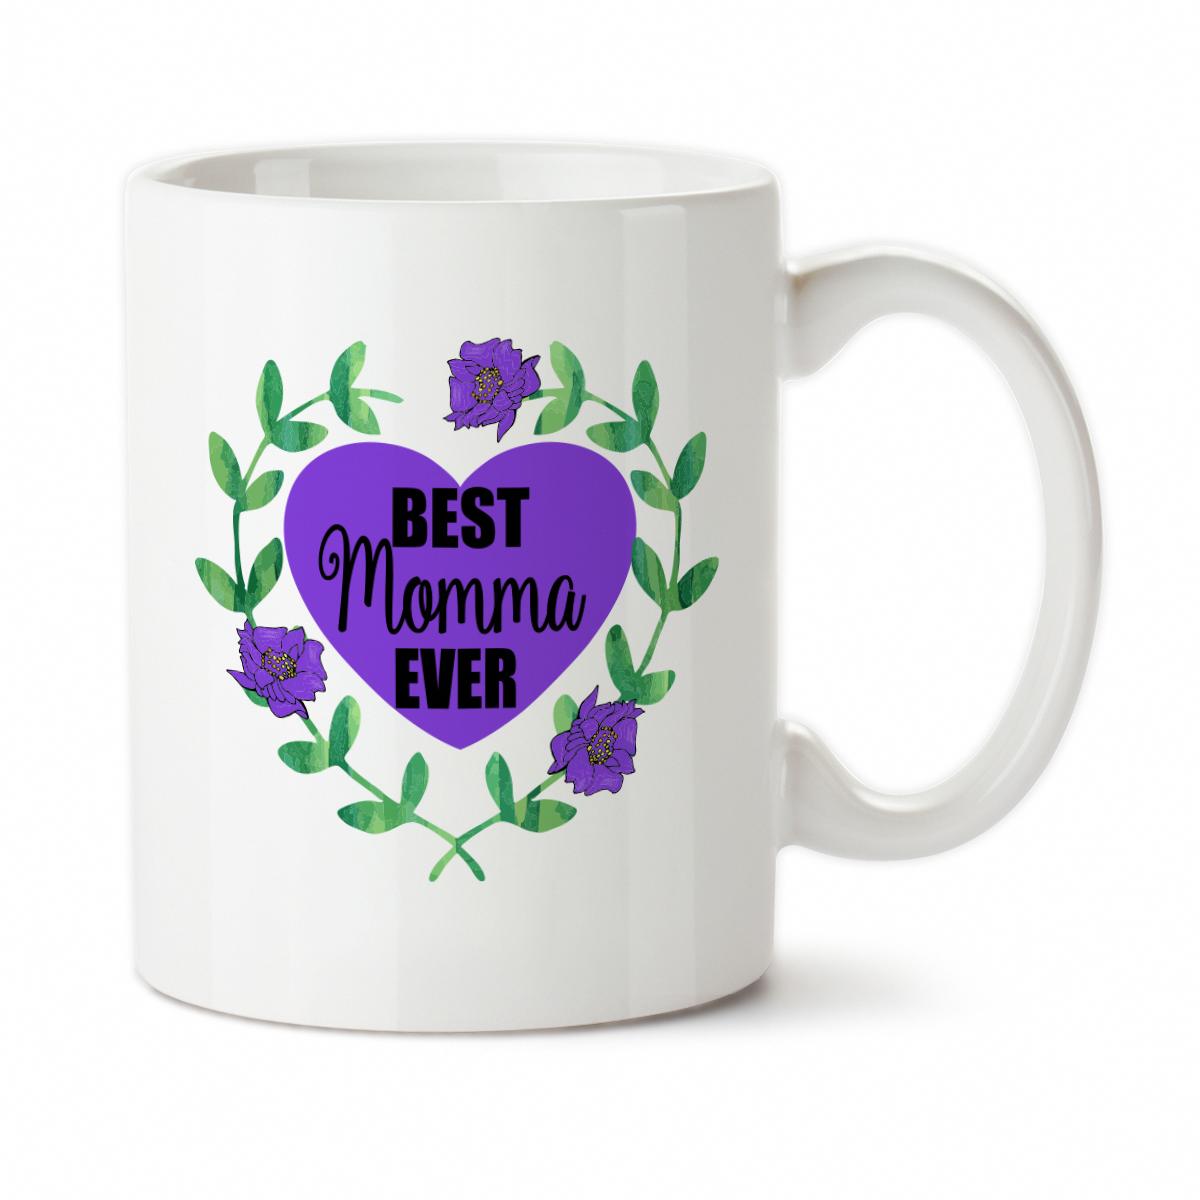 Best Momma Ever, Coffee Mug, Water Bottle, Travel Mug